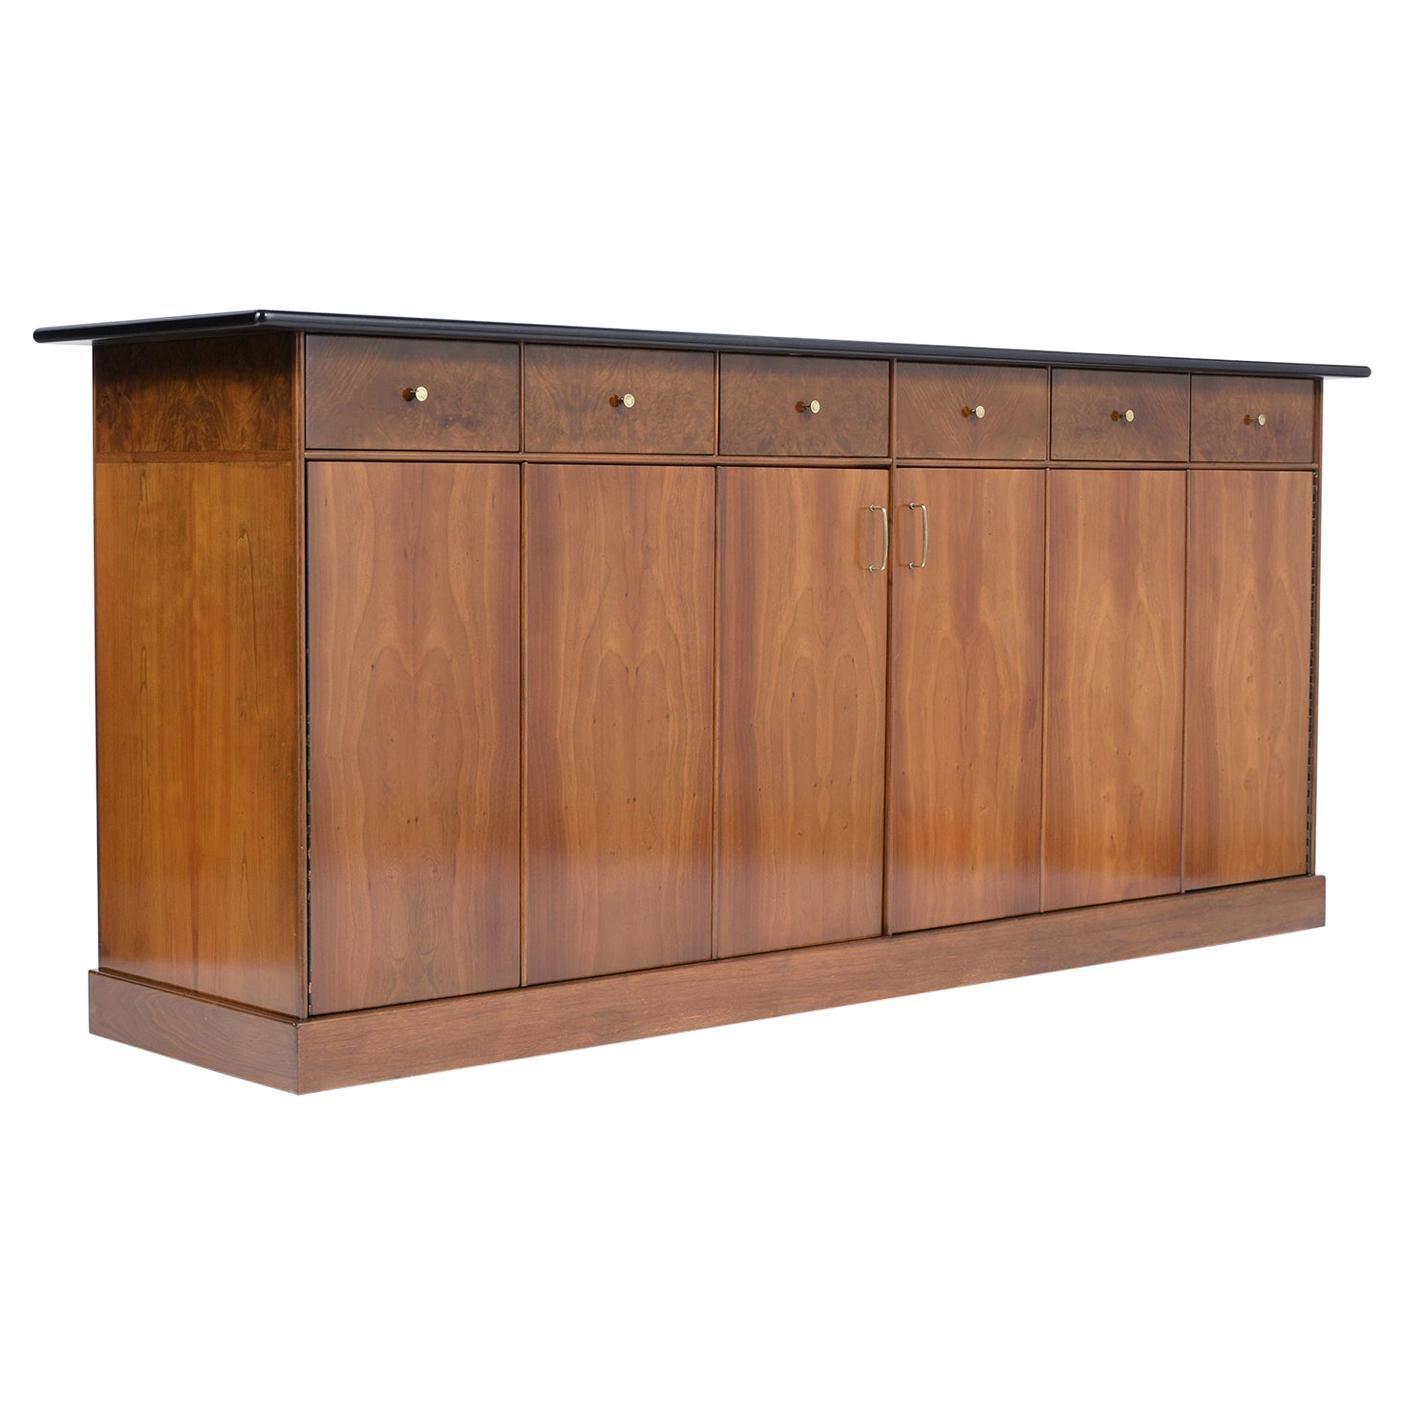 Milo Baughman Mid-Century Modern Cabinet